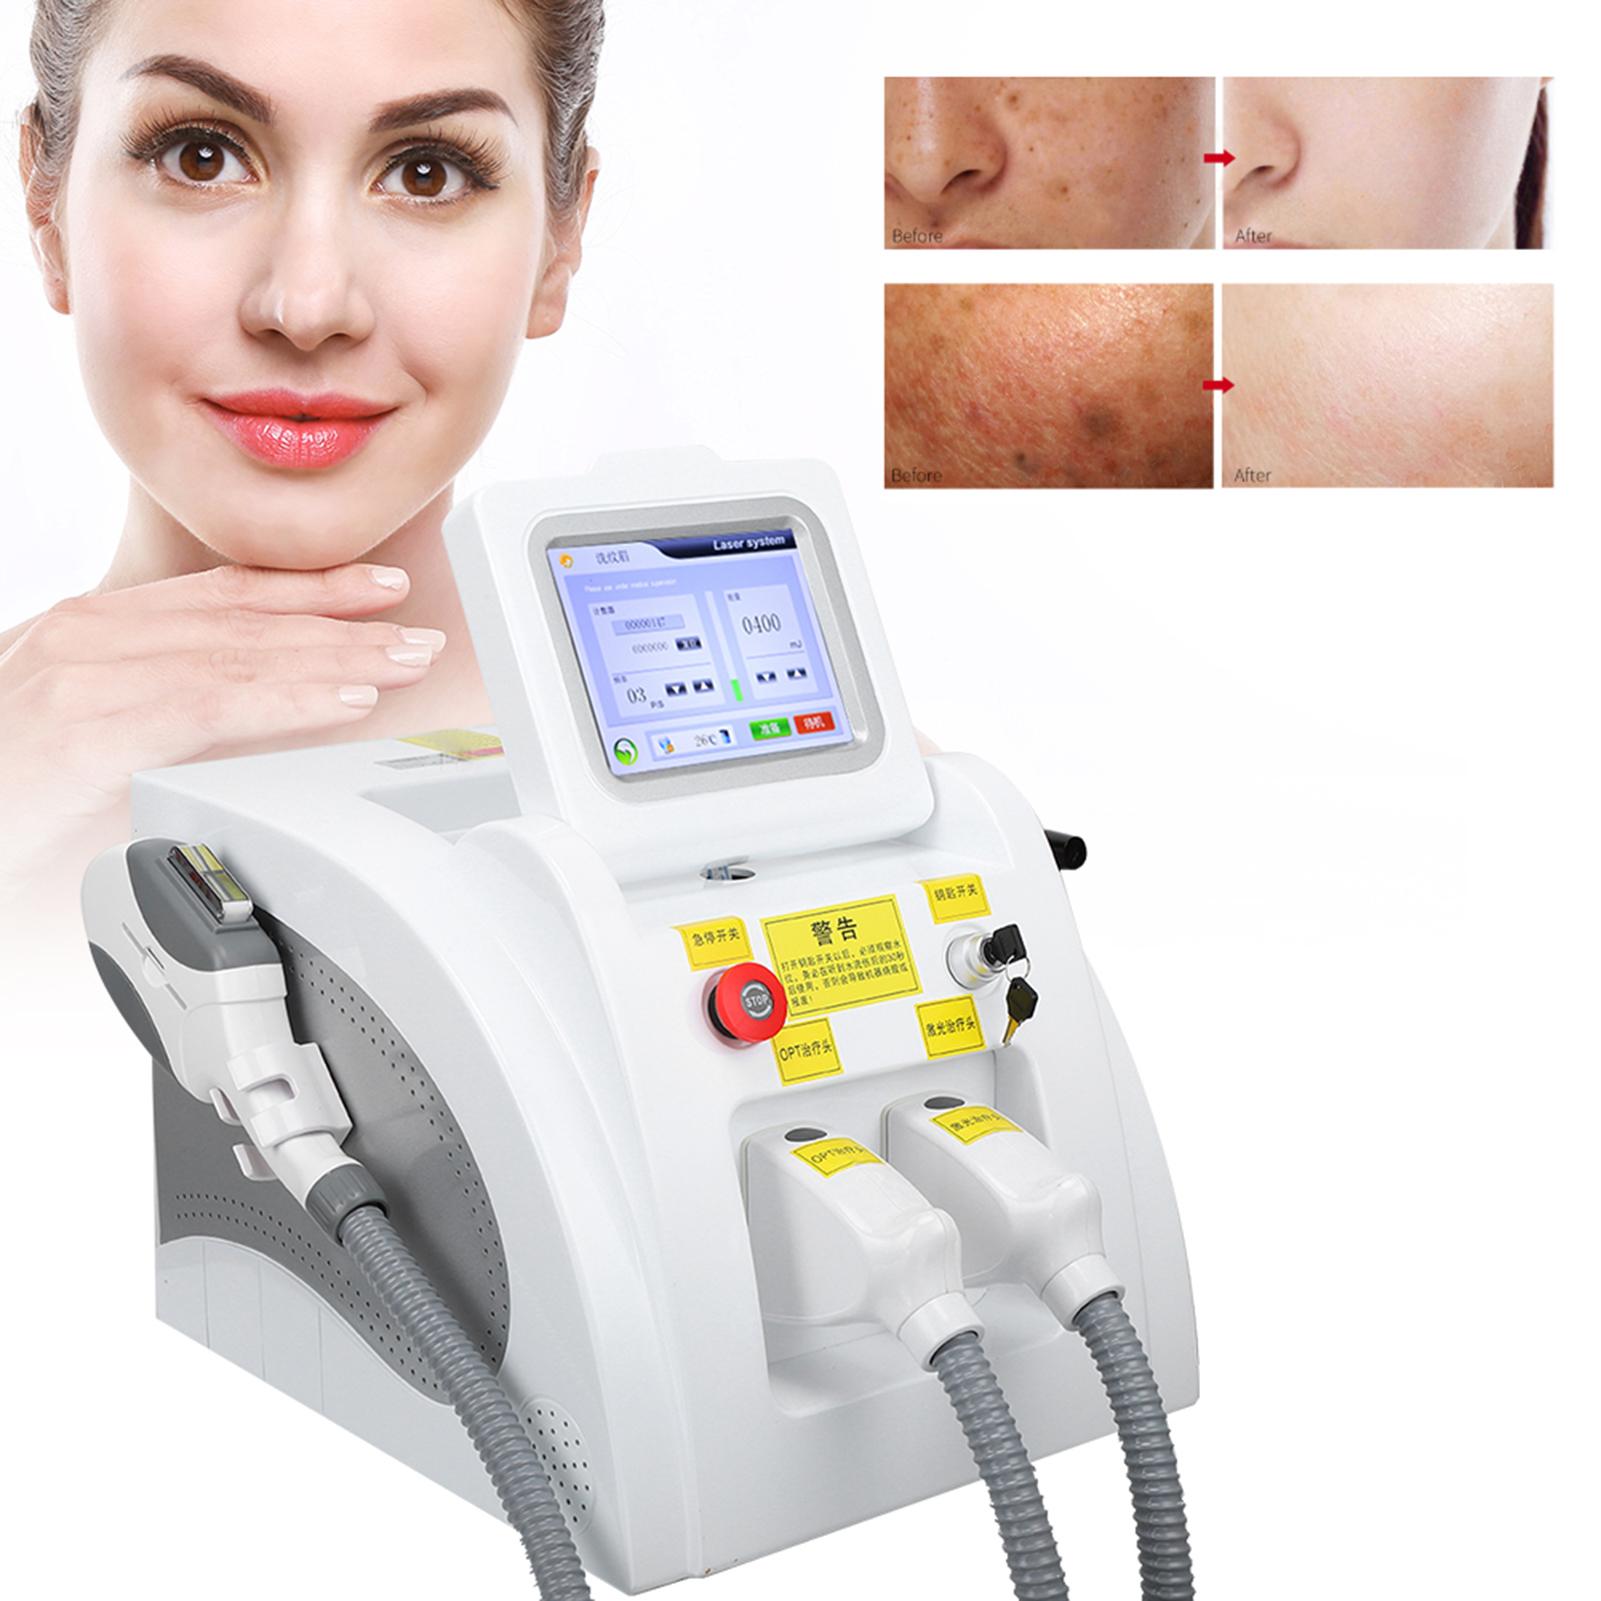 Indexbild 29 - 2In1 SHR OPT IPL Hair Removal RF Laser Skin Rejuvenation Tattoo Removal Machine